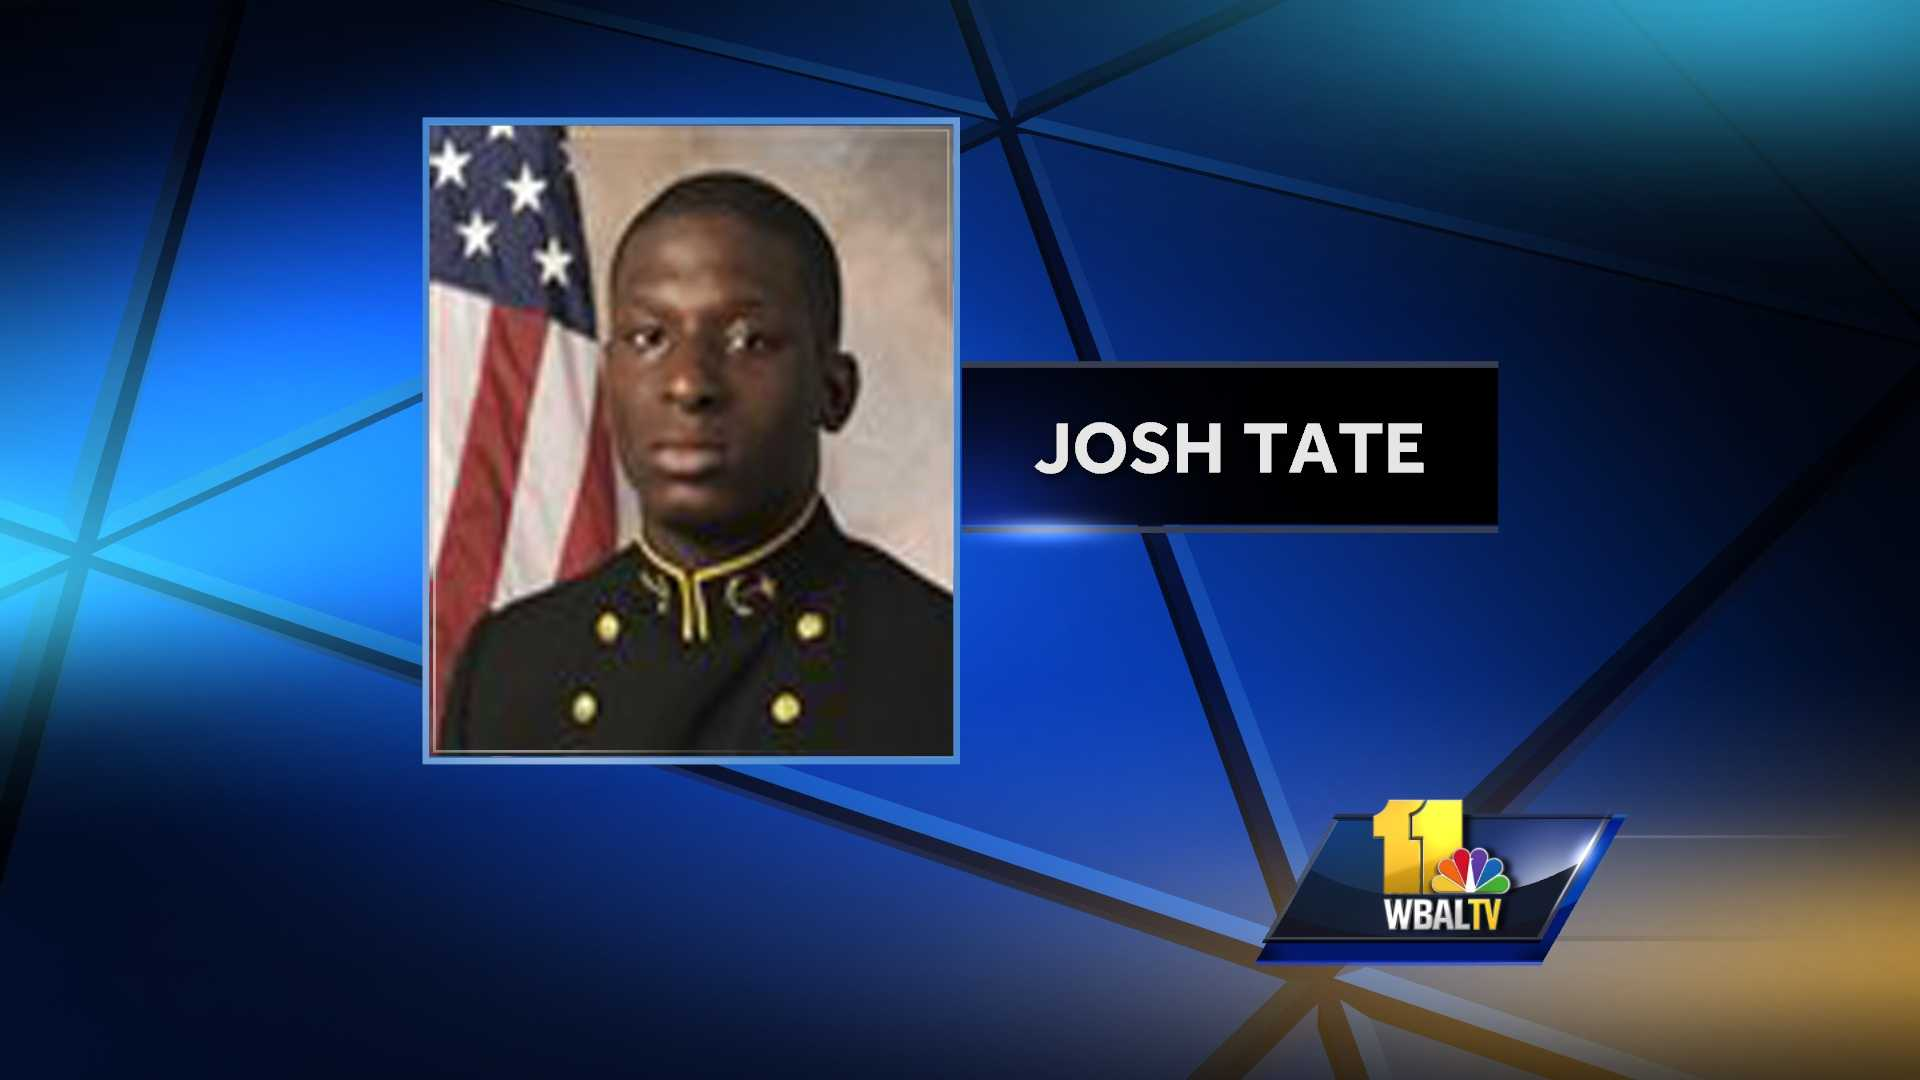 Josh Tate